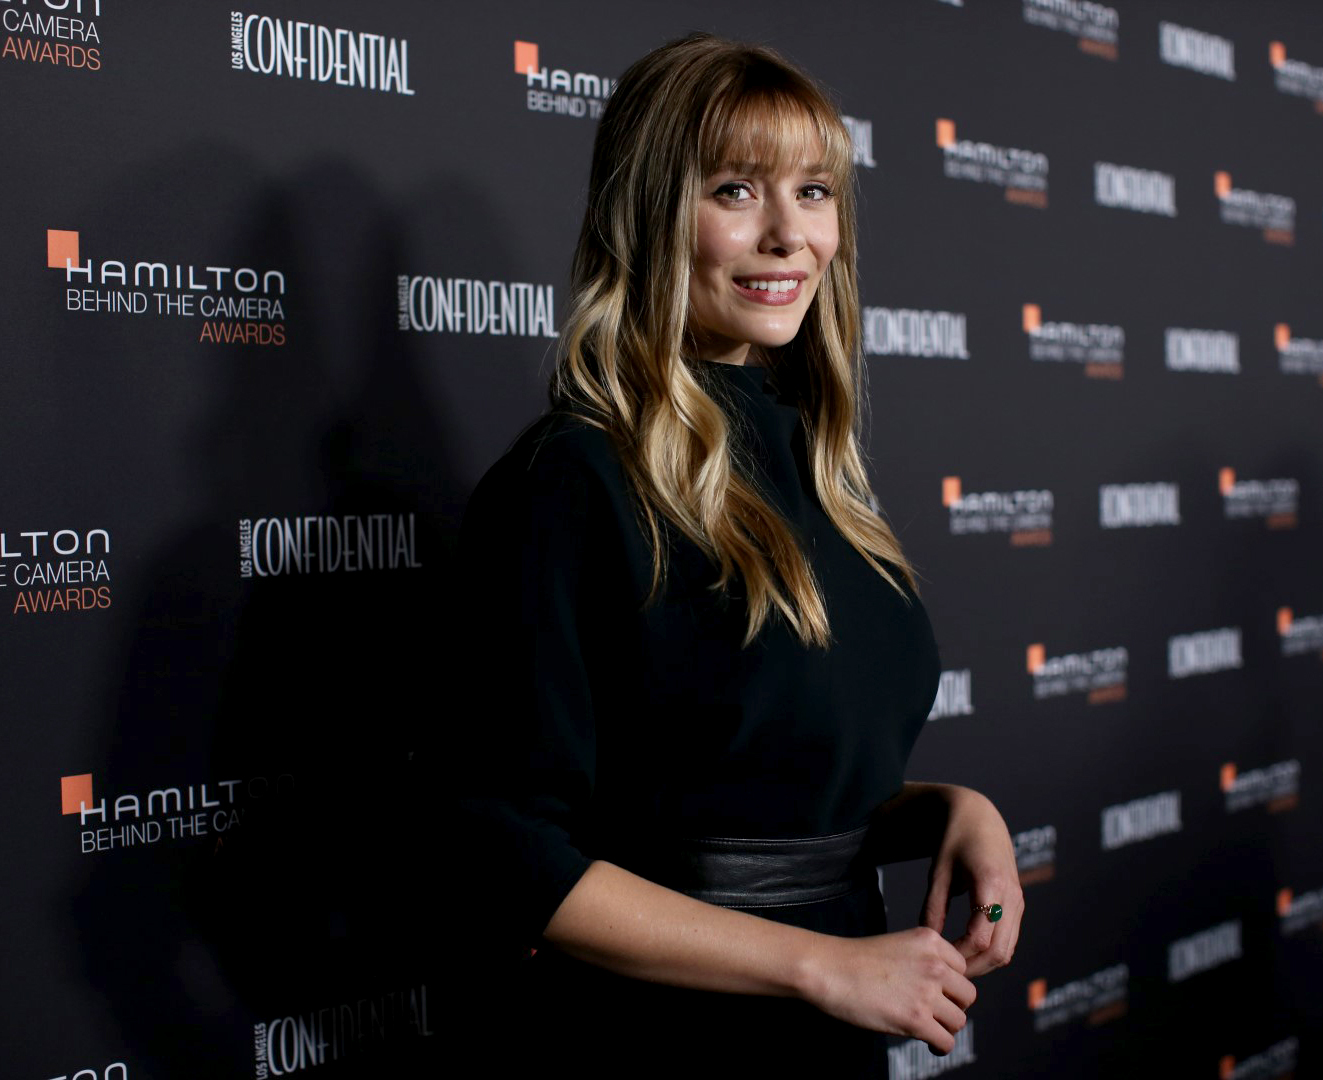 Hamilton Behind the Camera Awards 2018 - Elizabeth Olsen - Red Carpet.